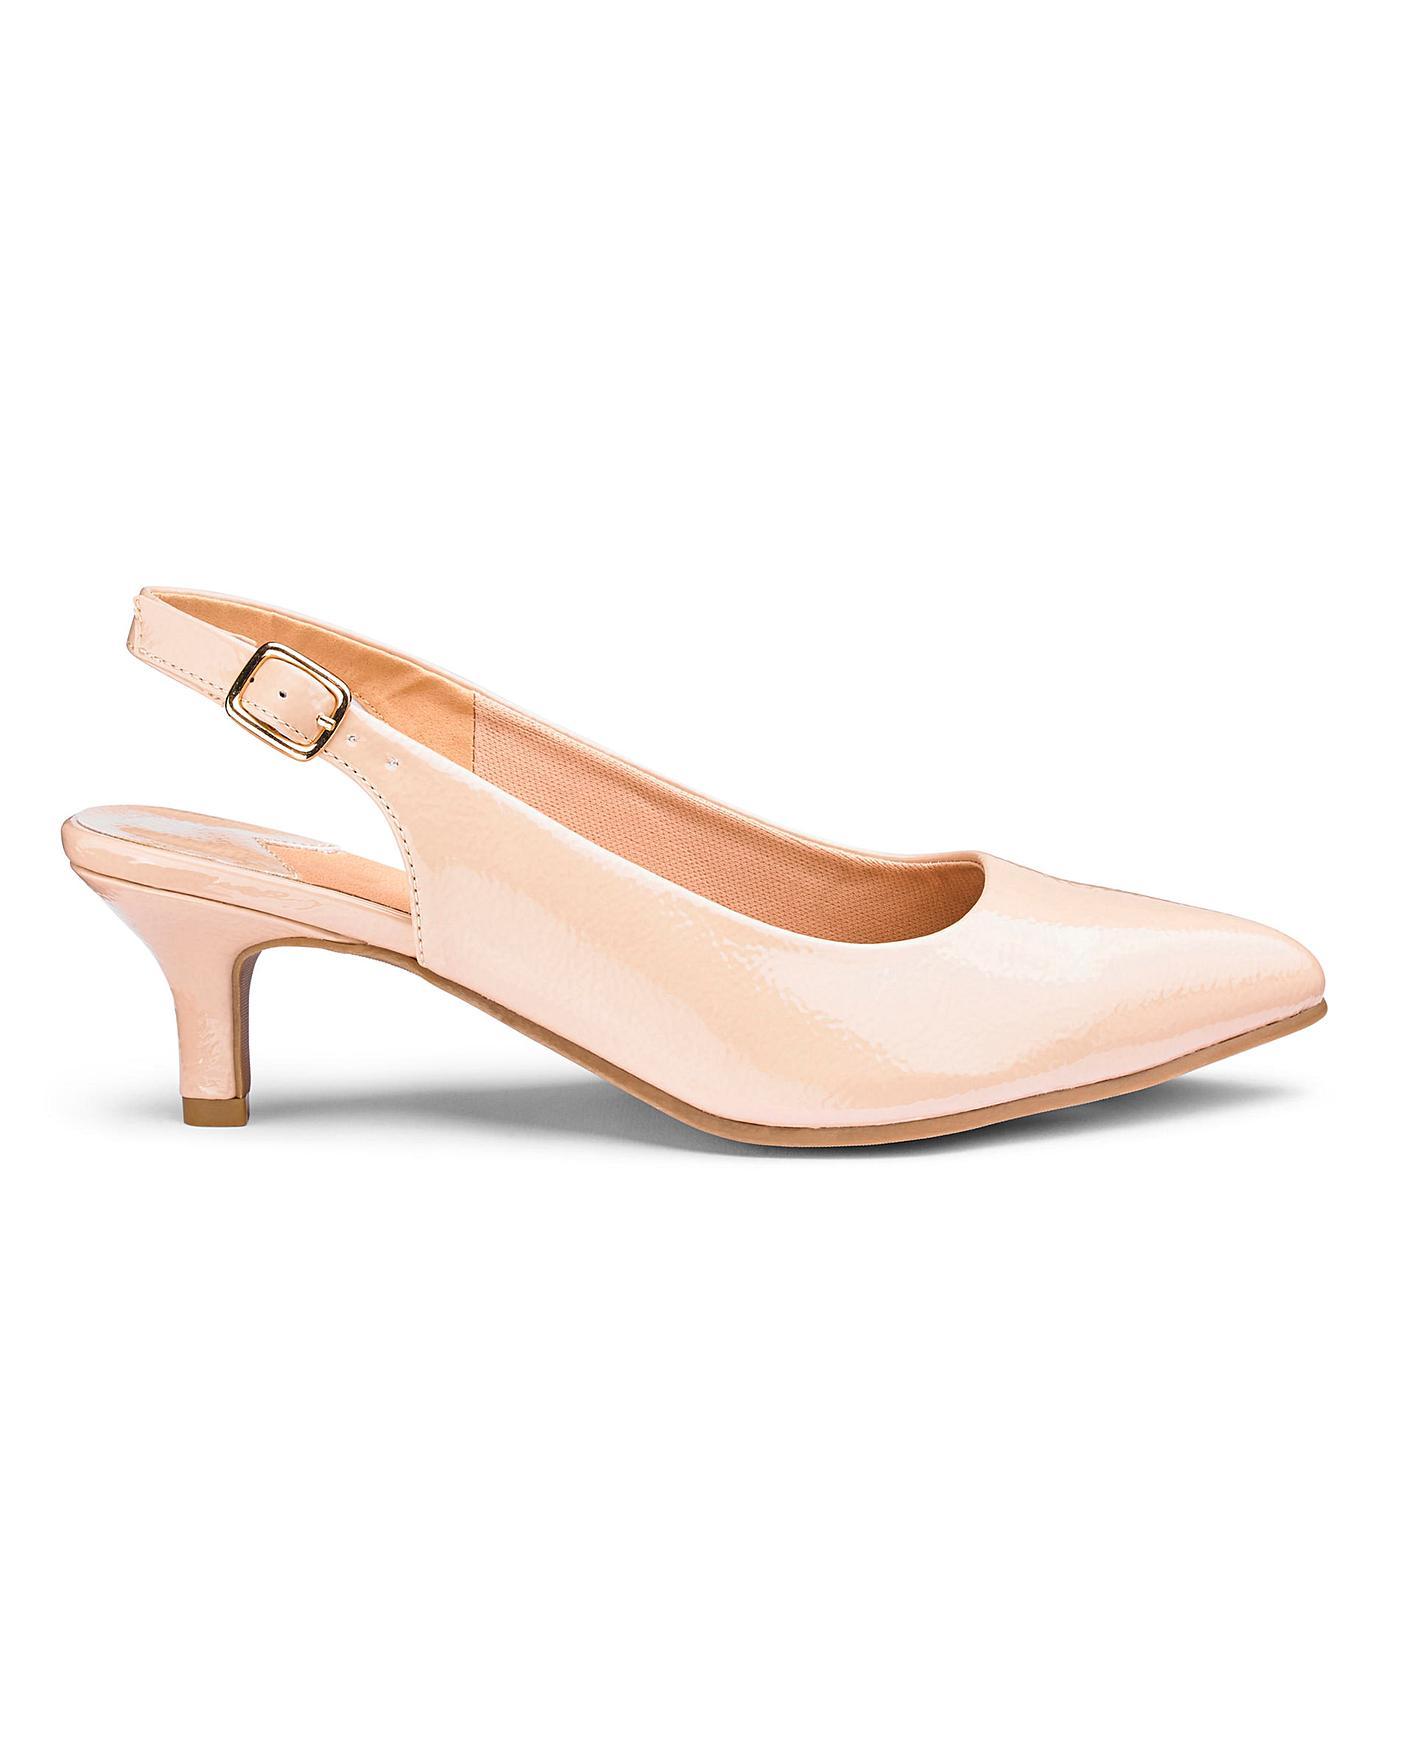 376753570f6 Flexi Sole Kitten Heel Shoes E Fit   Simply Be